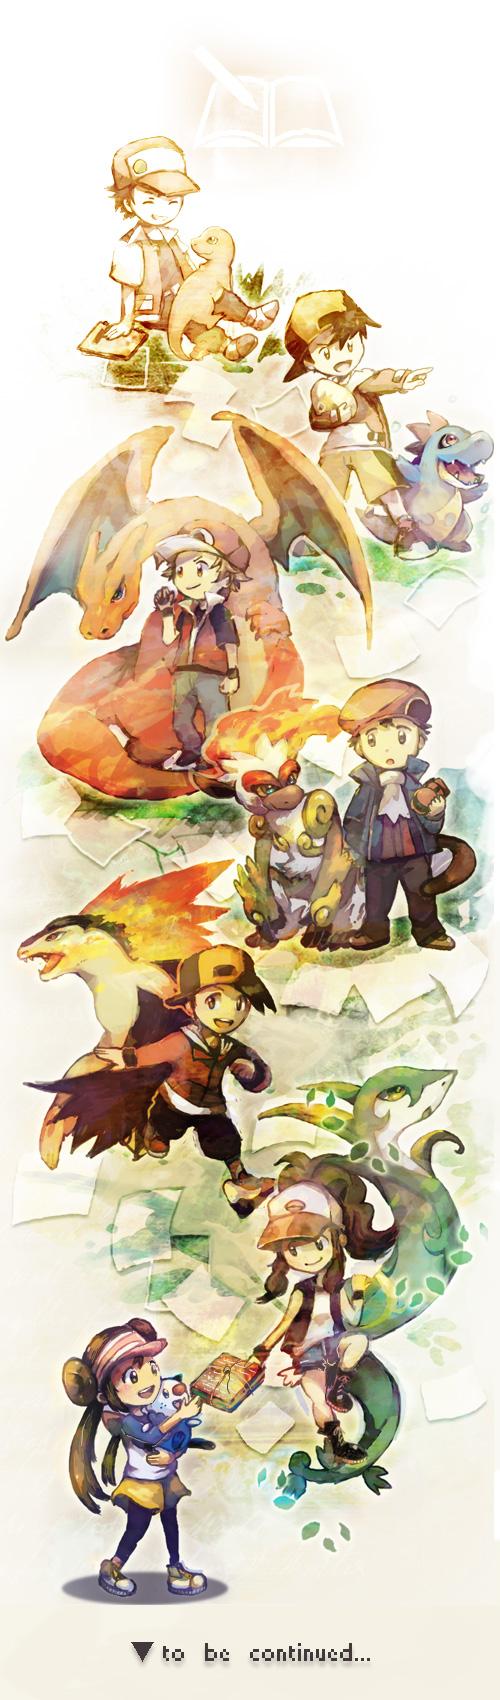 Tags: Anime, Sin Hitonatsu, Pokémon, Typhlosion, Charmander, Touko (Pokémon), Charizard, Infernape, Kouki (Pokémon), Mei (Pokémon), Red (Pokémon), Oshawott, Croconaw